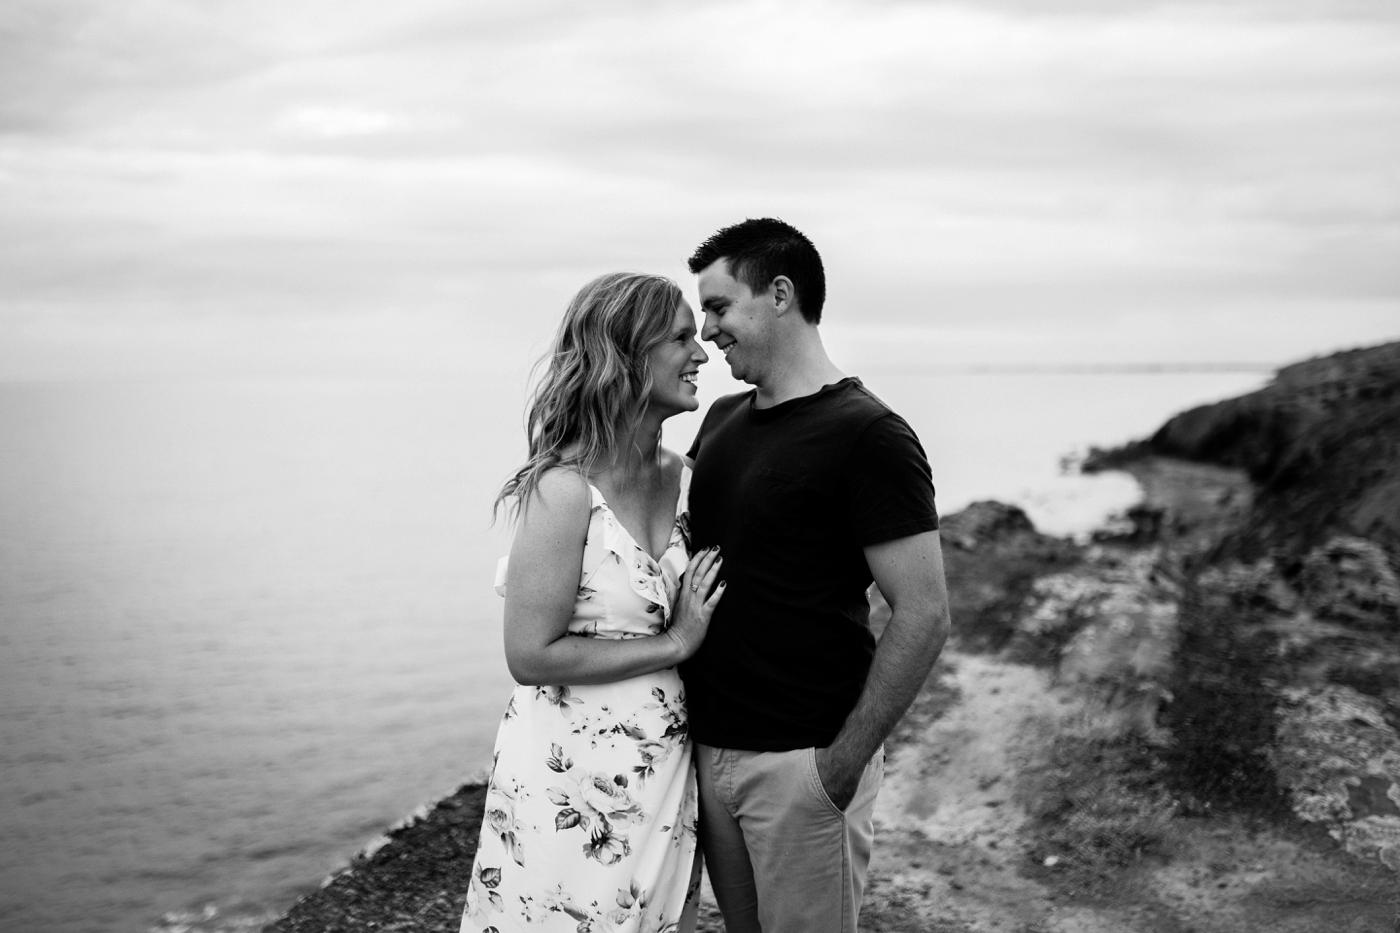 Lisa & Lachlan - Adelaide Engagement Photographer - Natural photographer in Adelaide - www.katherineschultzphotography.com 1